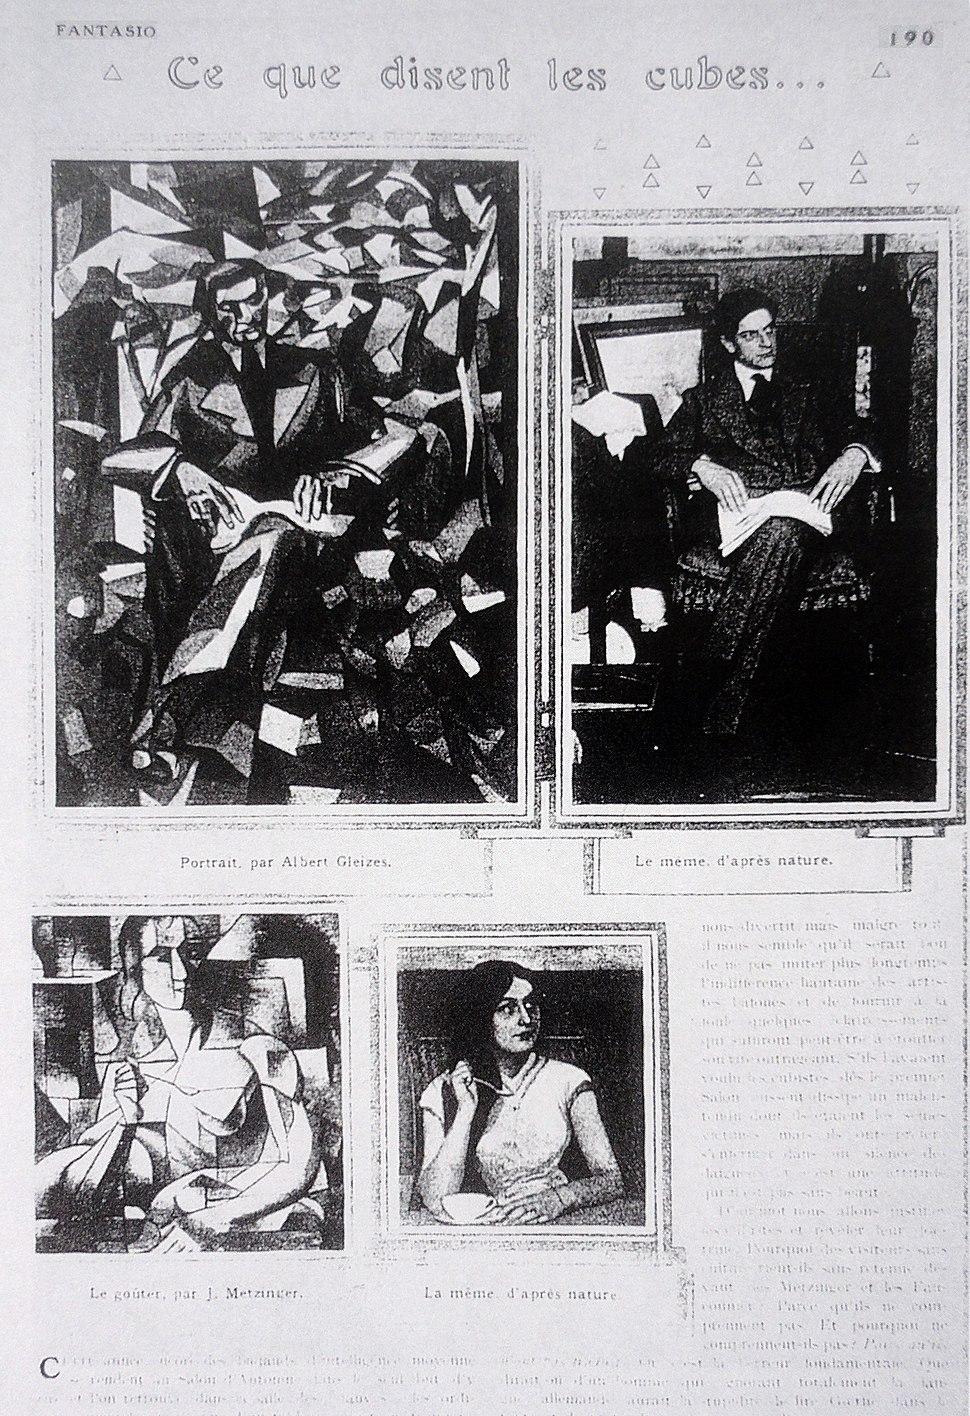 Fantasio, 15 October 1911, Albert Gleizes, Portrait of Jacques Nayral, Jean Metzinger, Le Gouter, Tea Time, 1911..